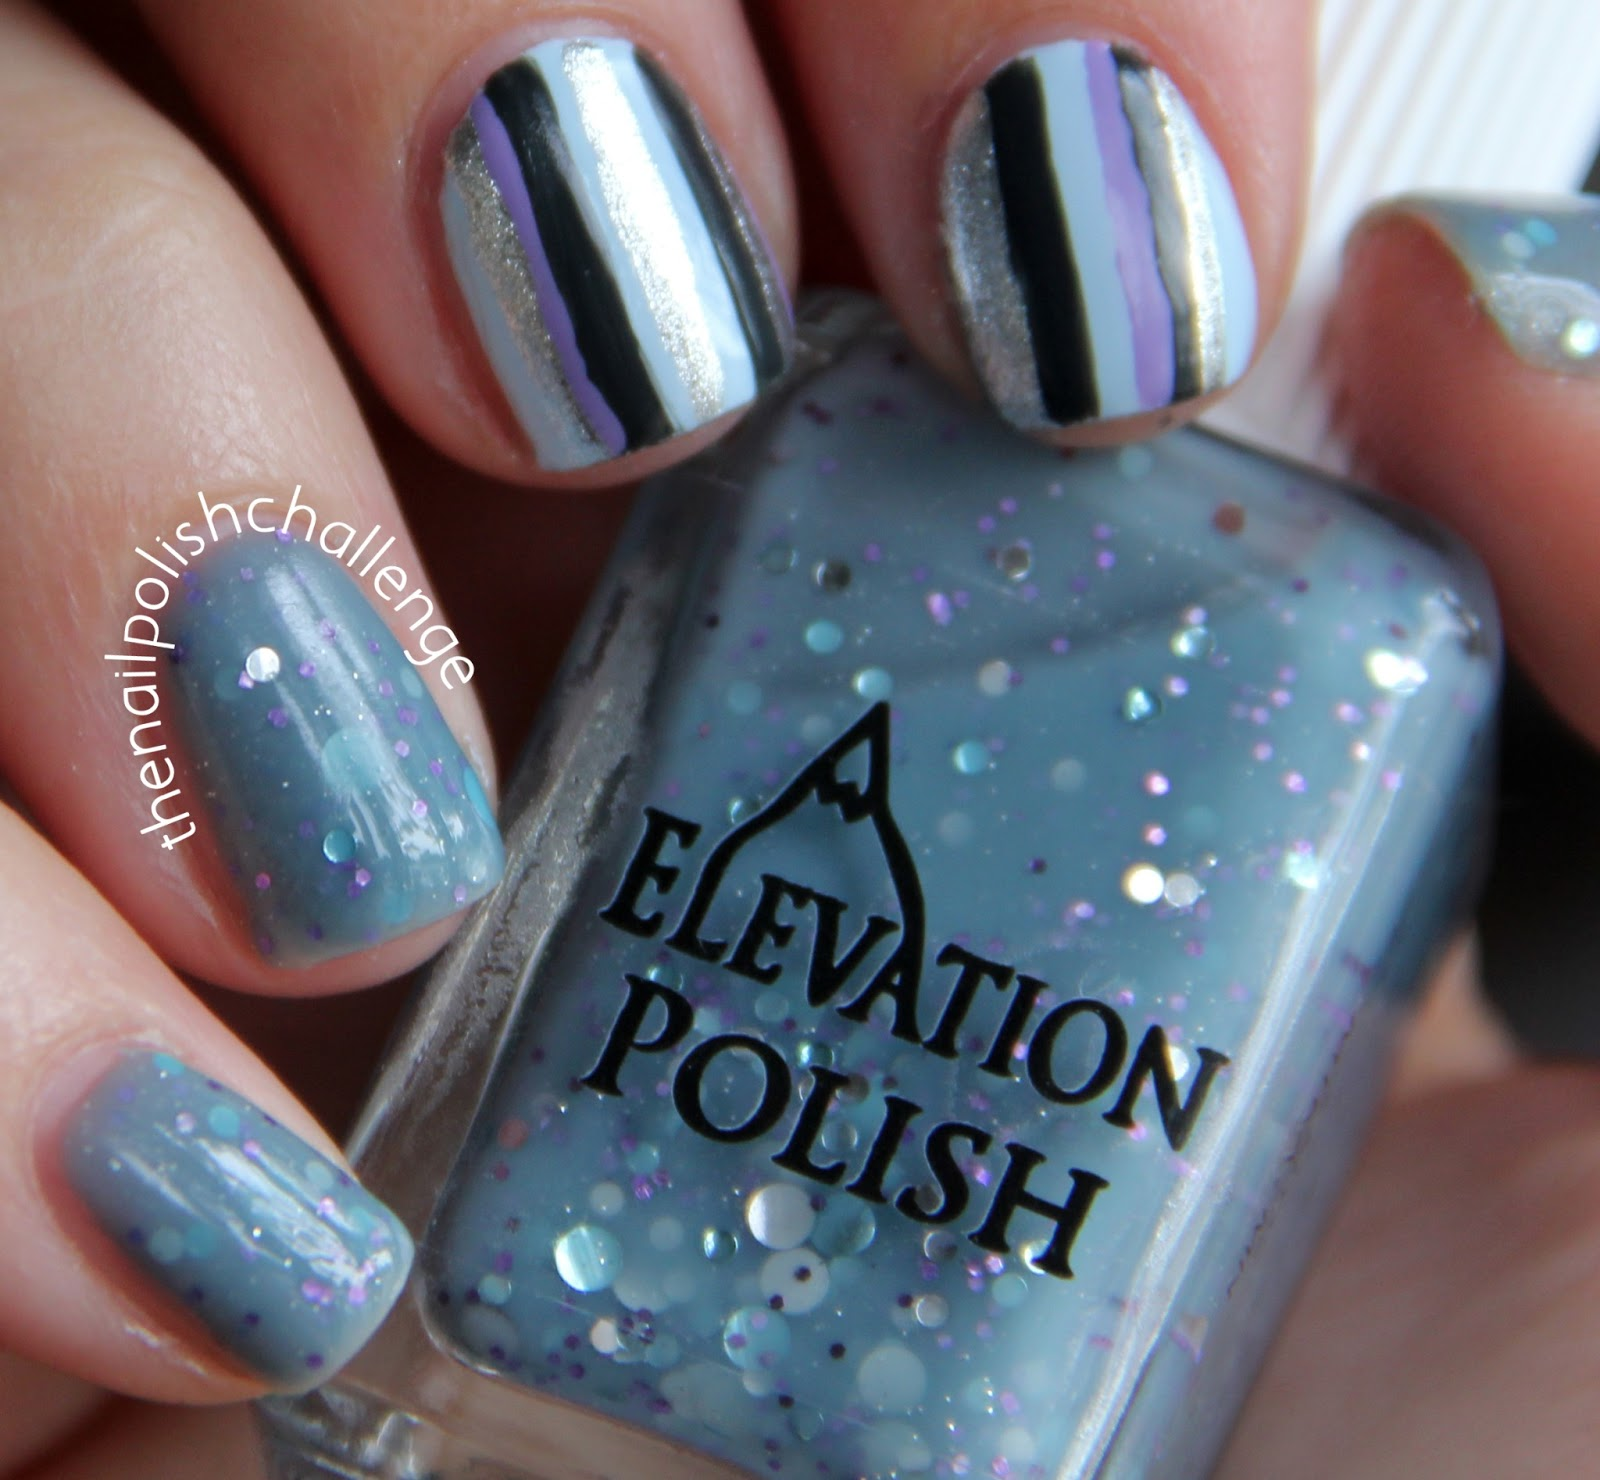 Concrete And Nail Polish Striped Nail Art: Kelli Marissa: Striped Nail Art With Elevation Marmolada